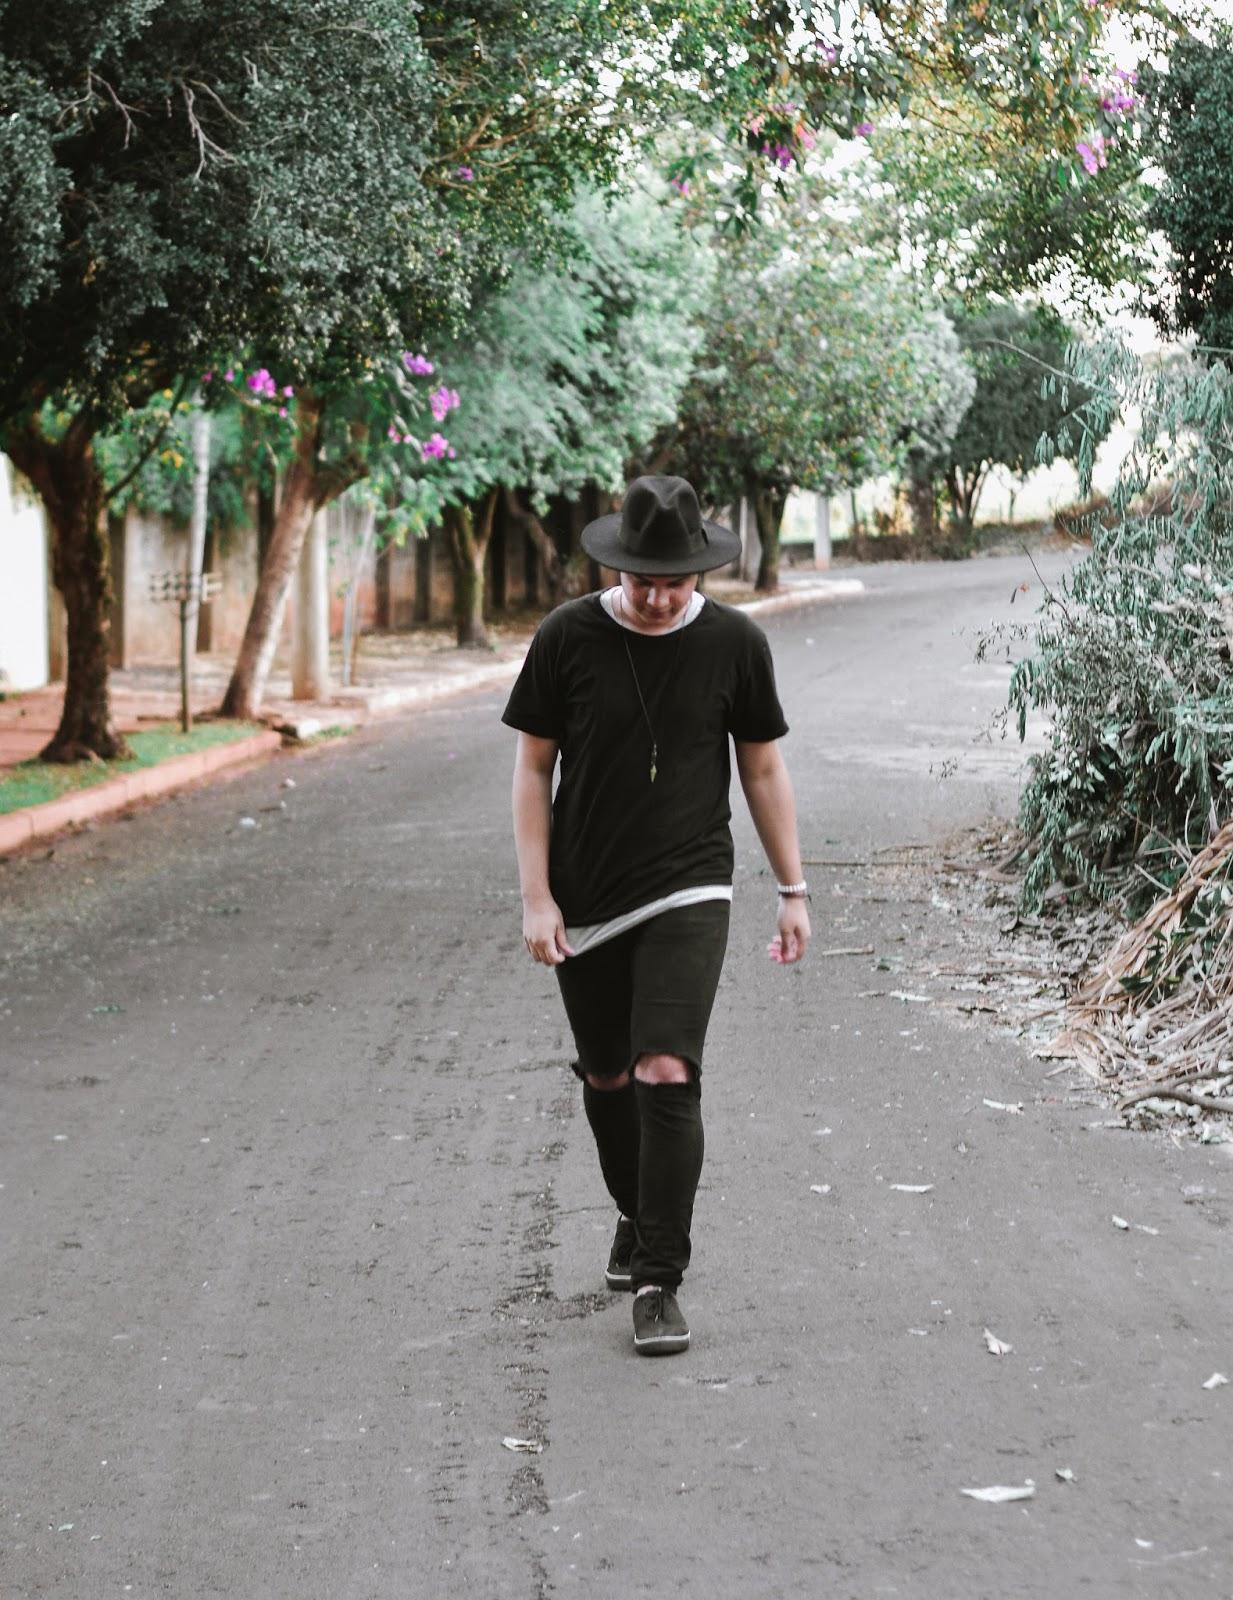 Look Masculino All Black com Chapéu Fedora Preto, Calça Skinny Preta Destroyed, Camiseta Preta